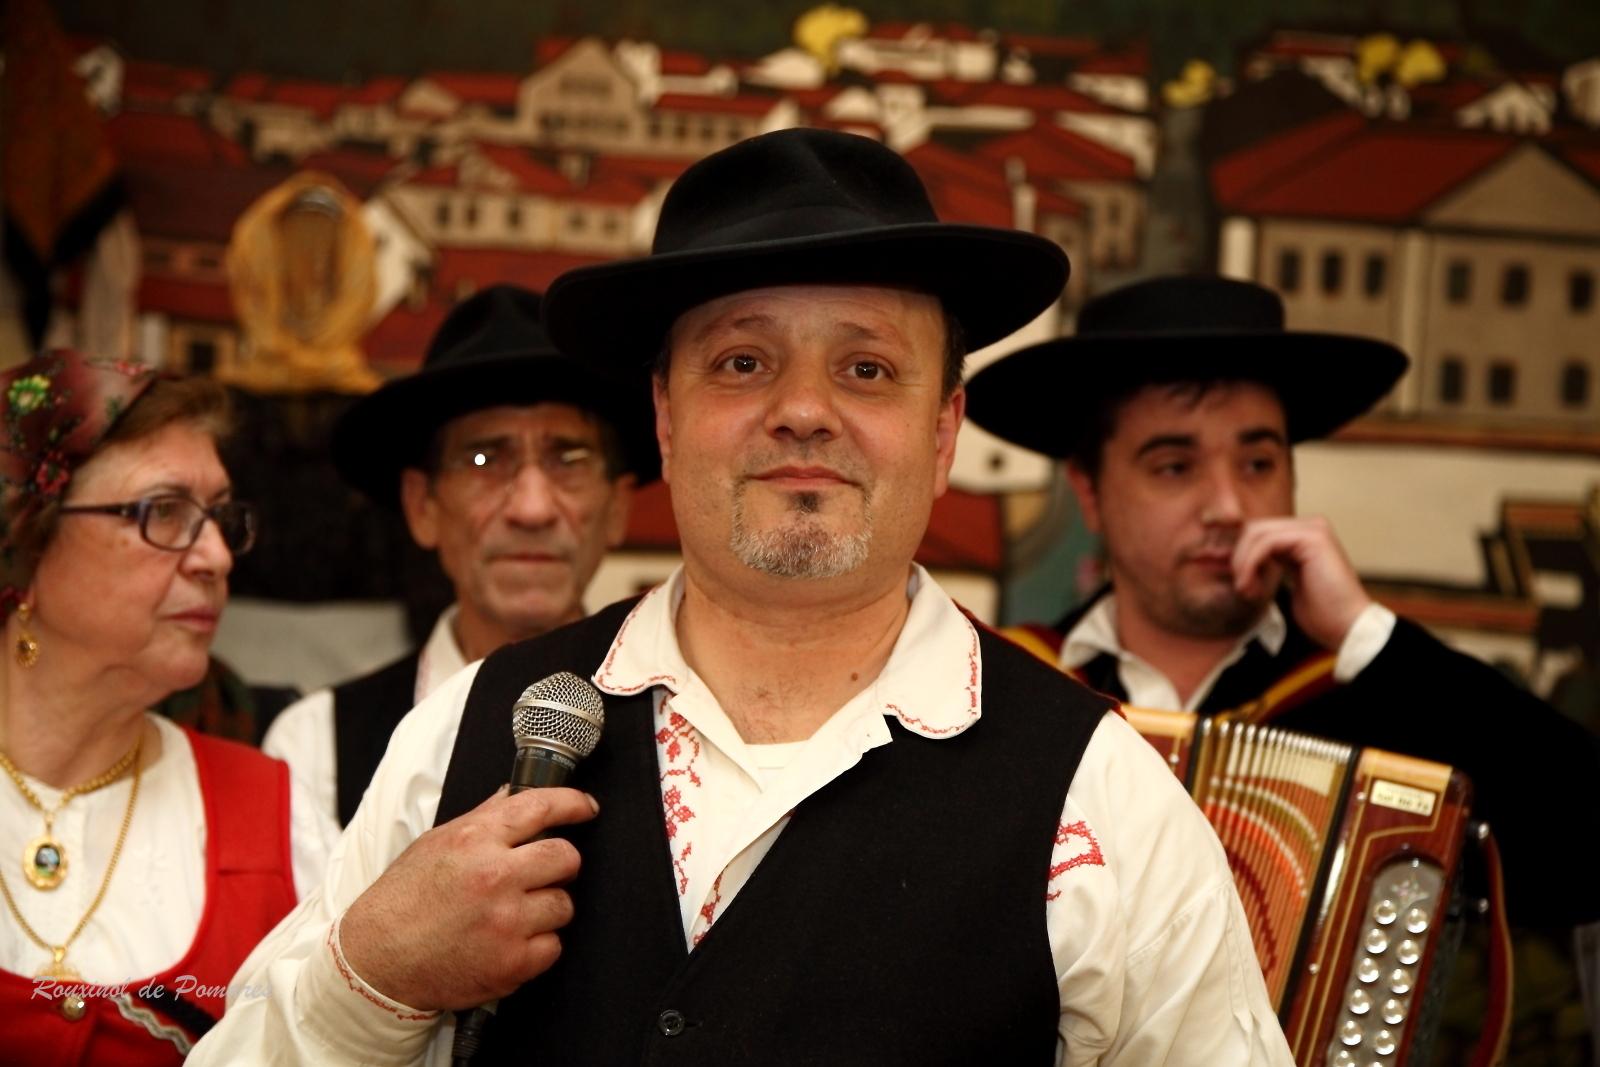 Festa Regionalista Casa da Comarca (0021)